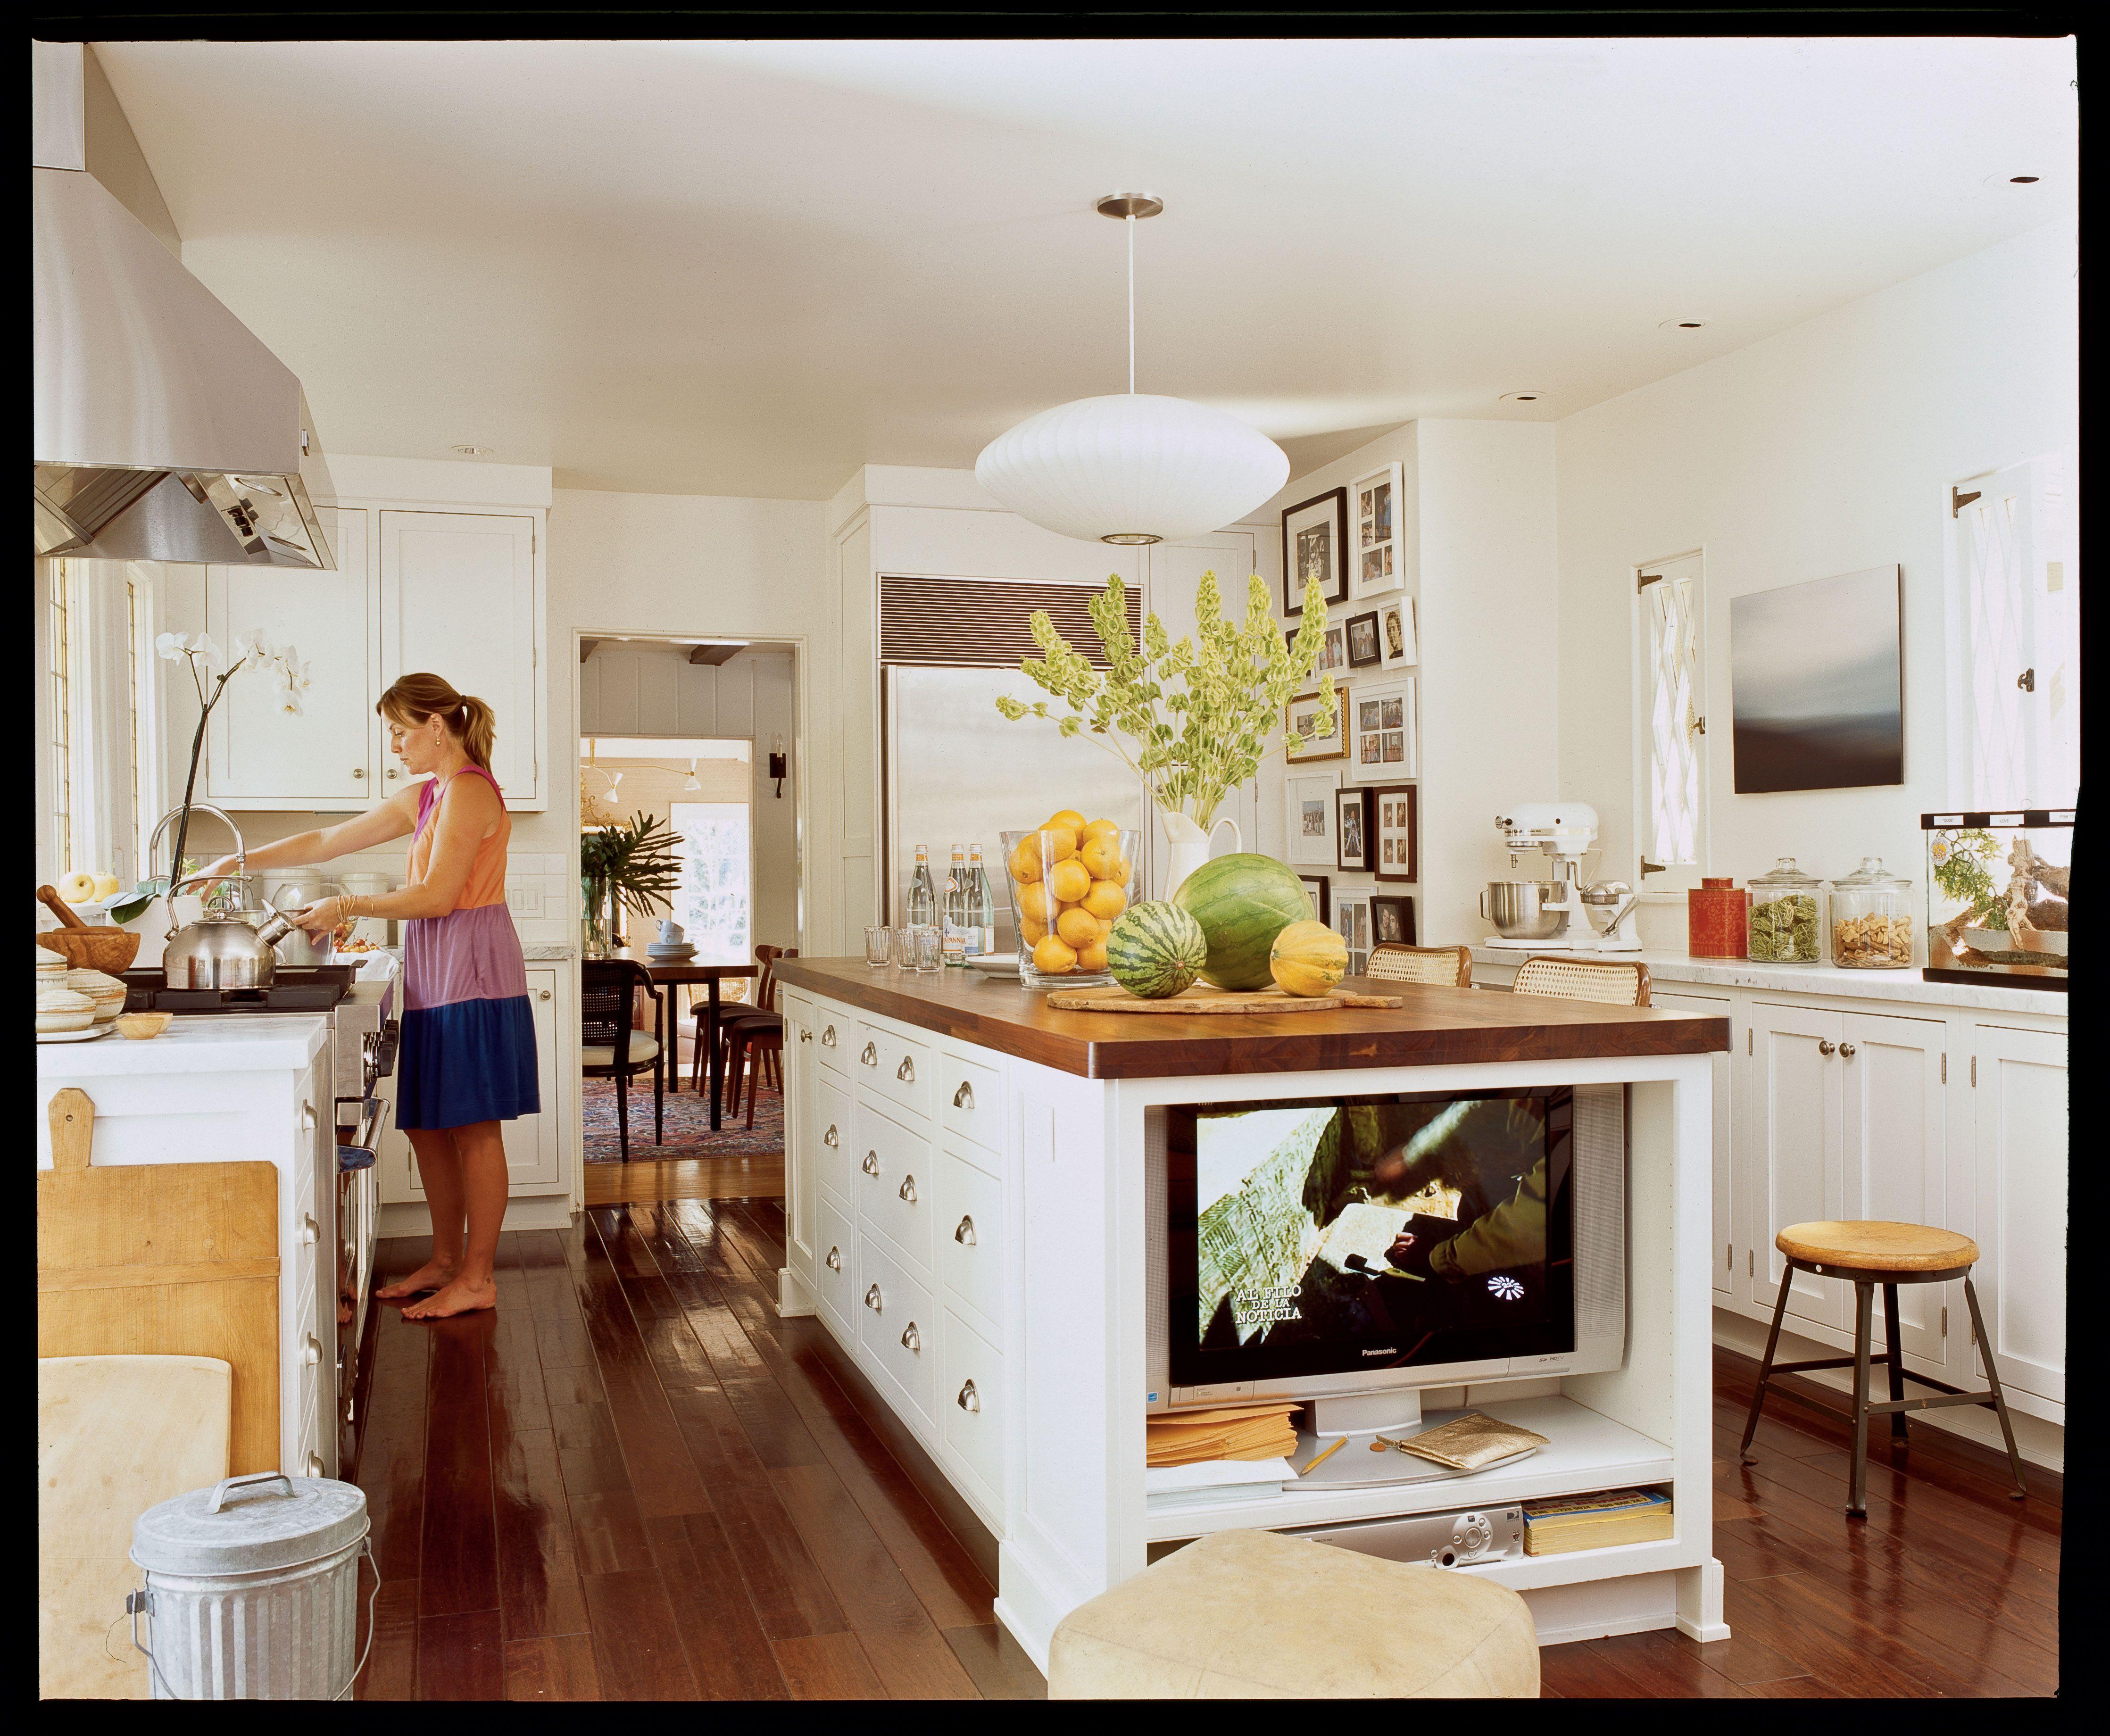 100 Comfy Cottage Rooms Cottage Room Diy Kitchen Island Kitchen Flooring